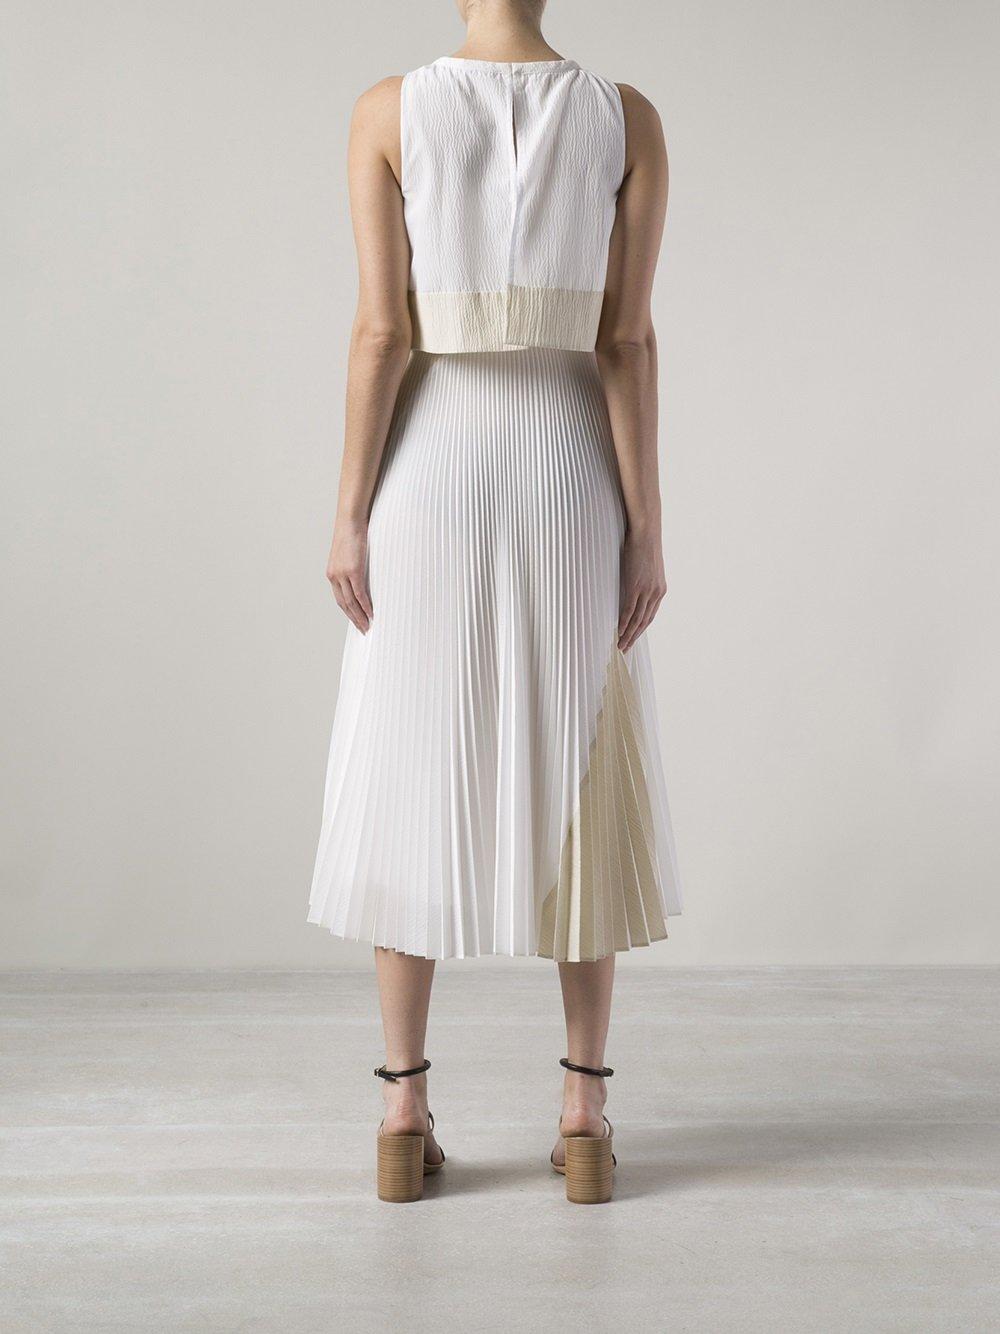 Proenza schouler Long Pleated Skirt Dress in White | Lyst